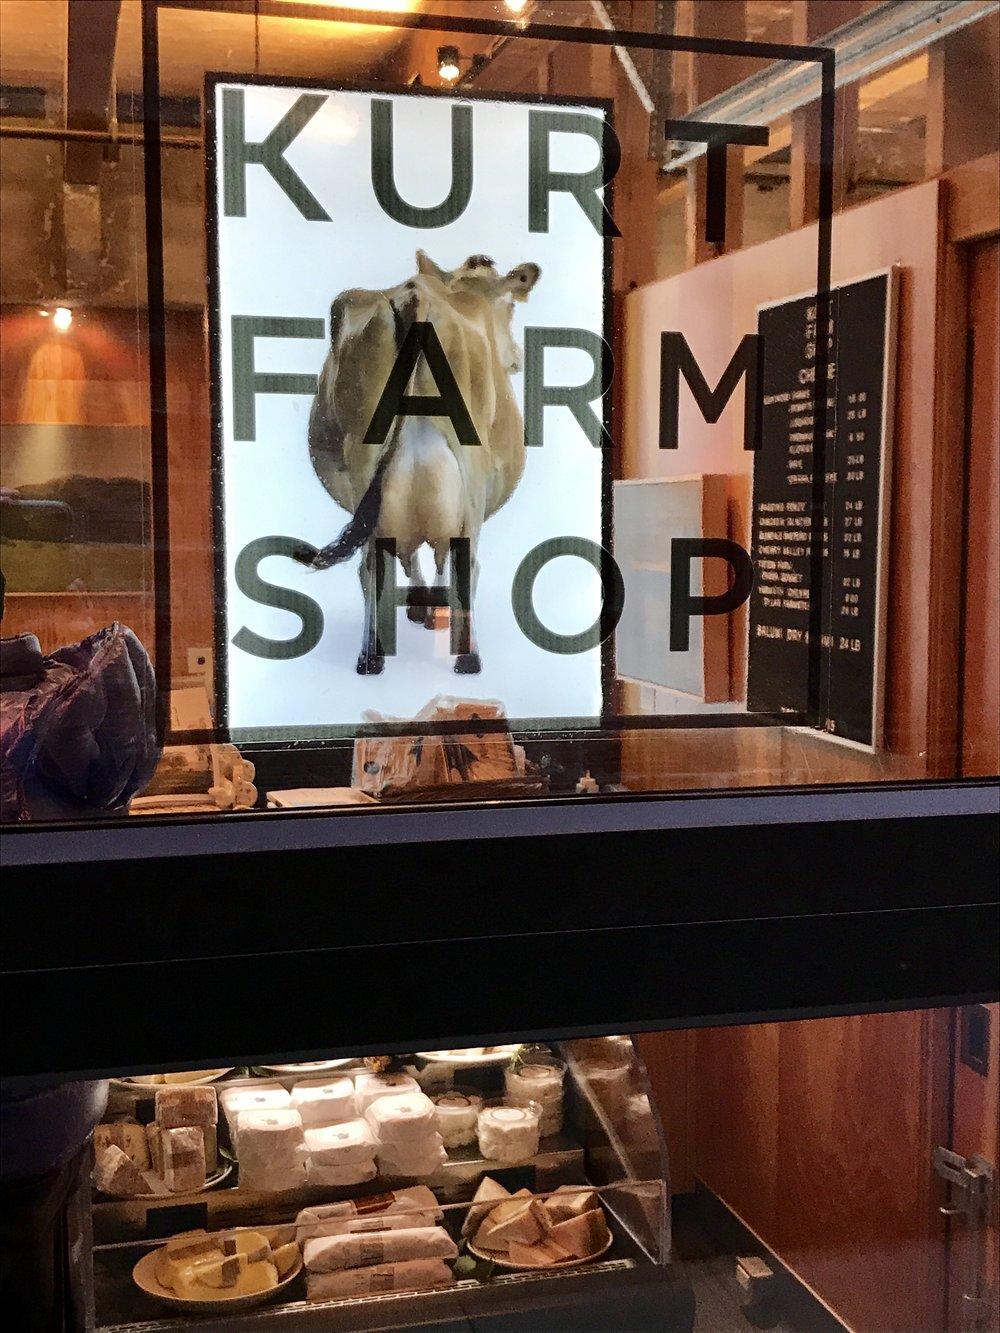 Cap Hill_Kurt Farm Shop.jpg